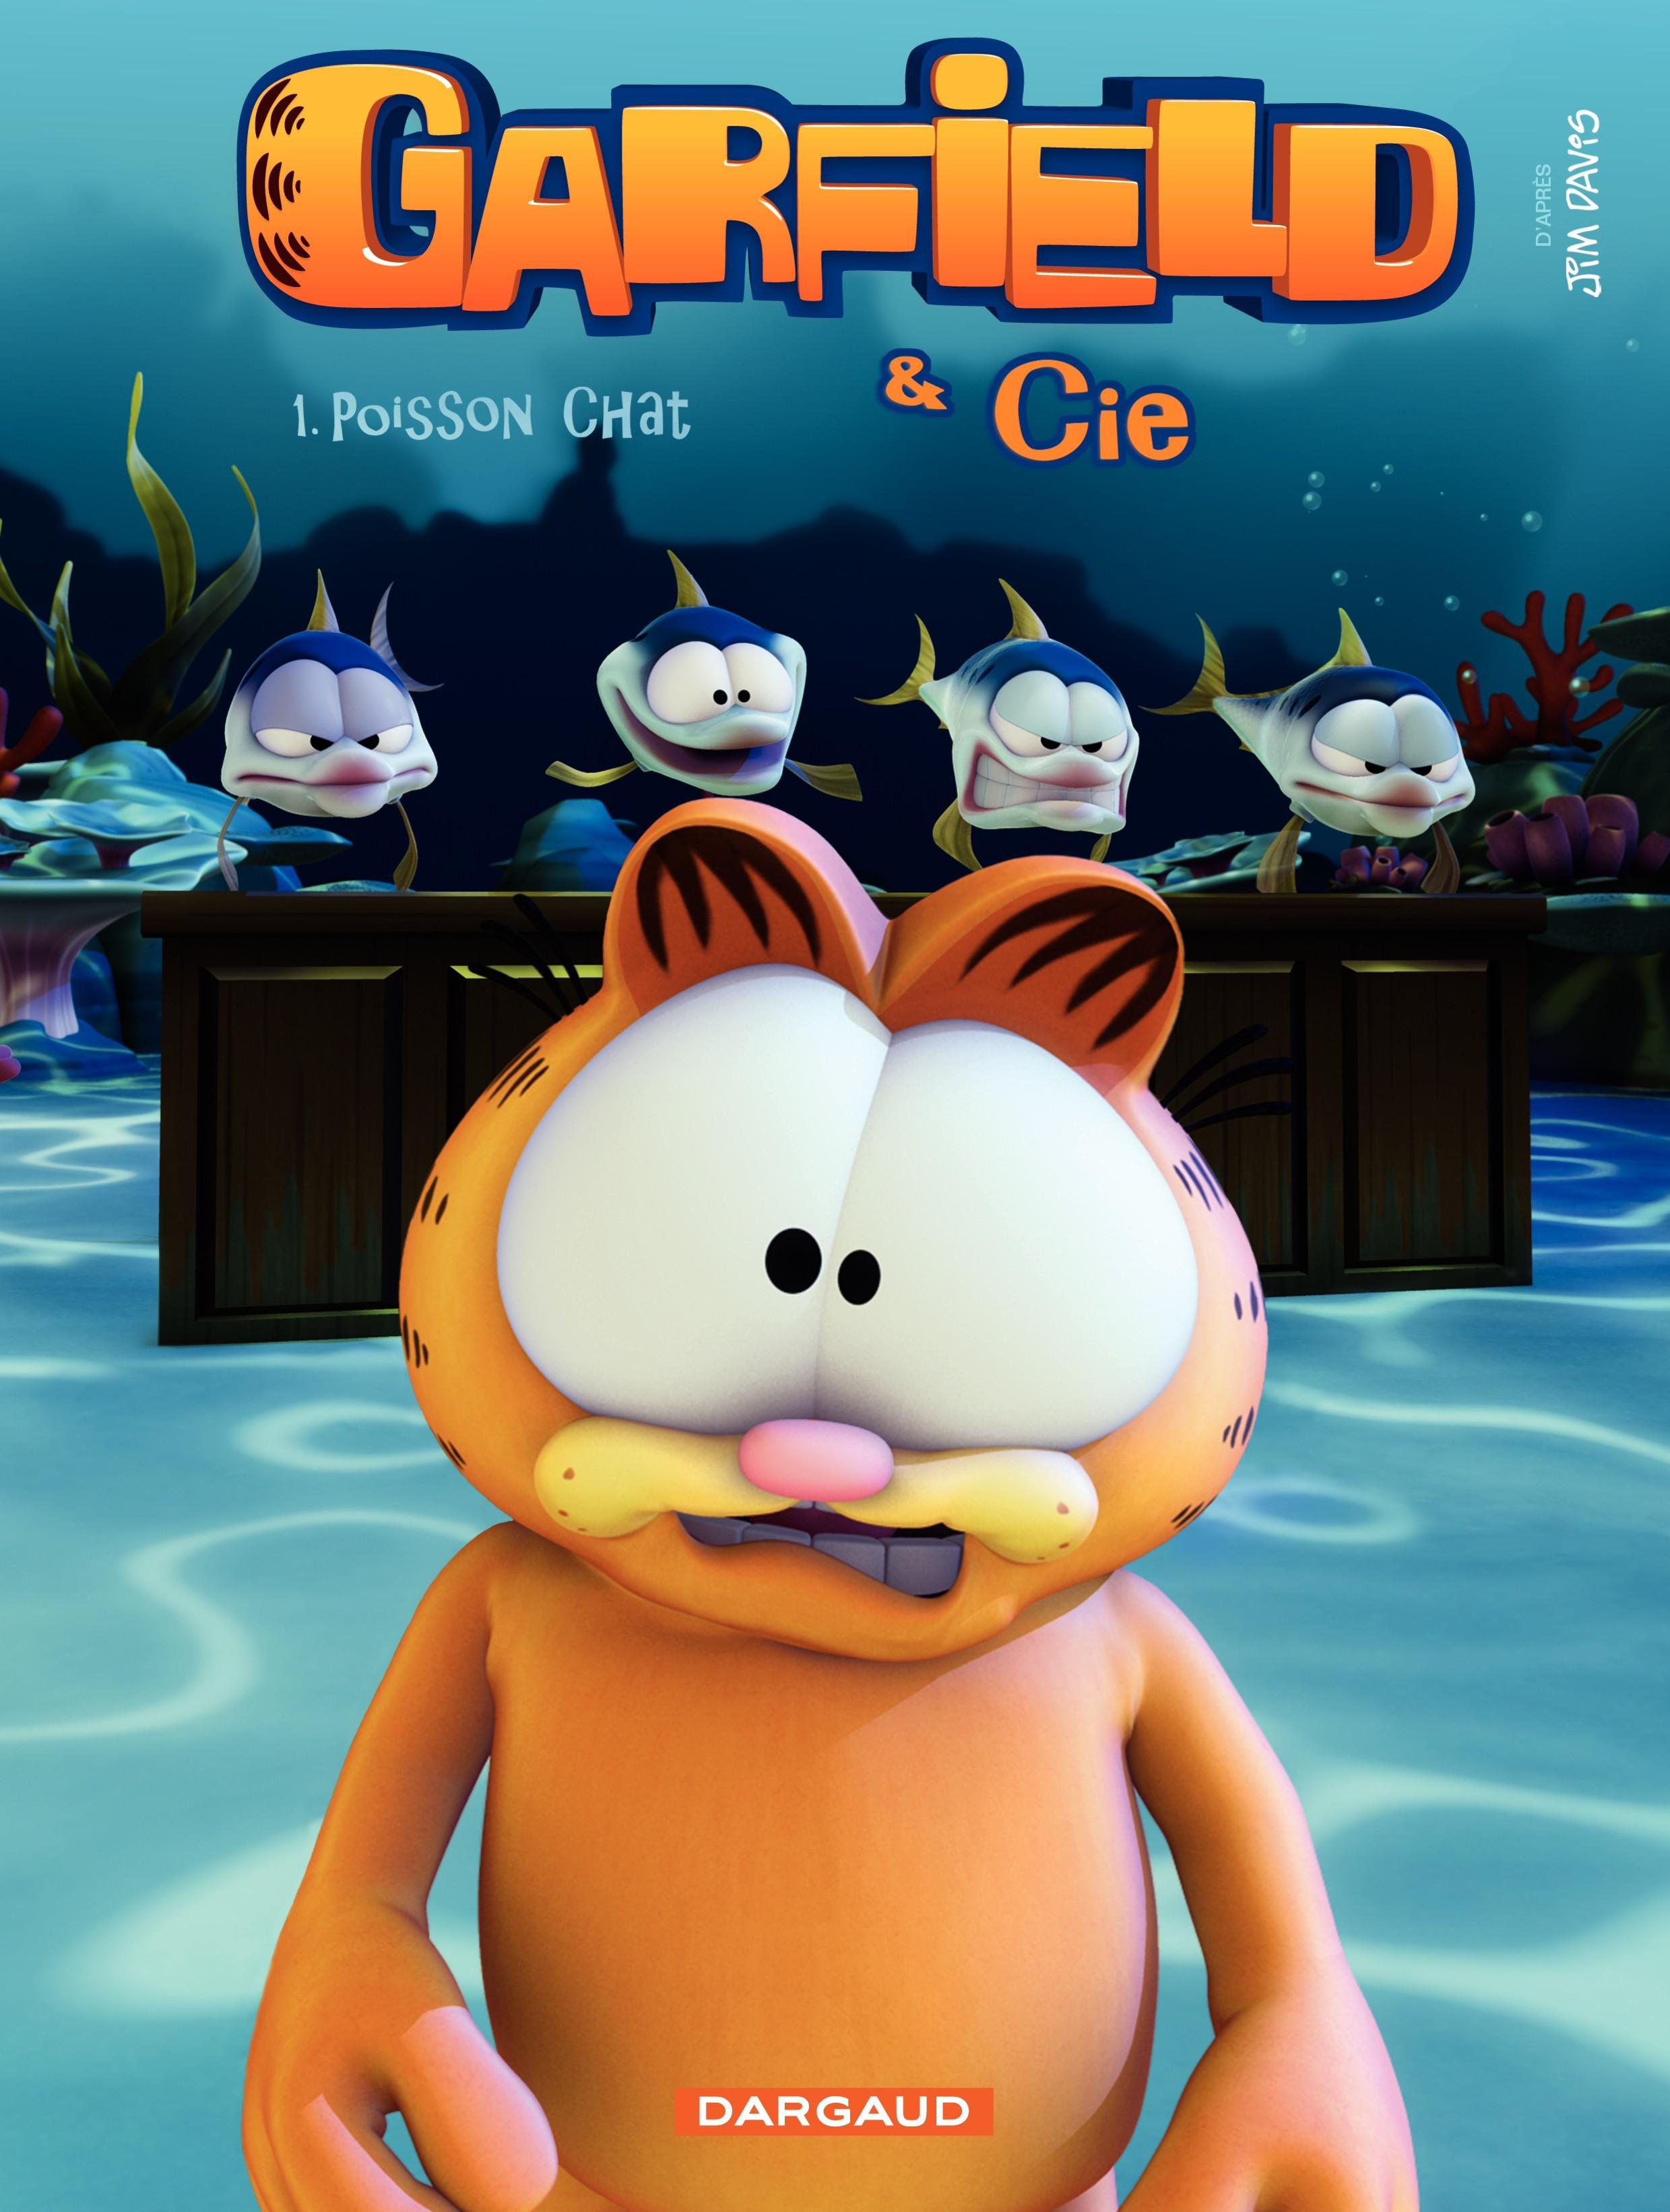 Garfield et Cie - Tome 1 - Poisson Chat (1)